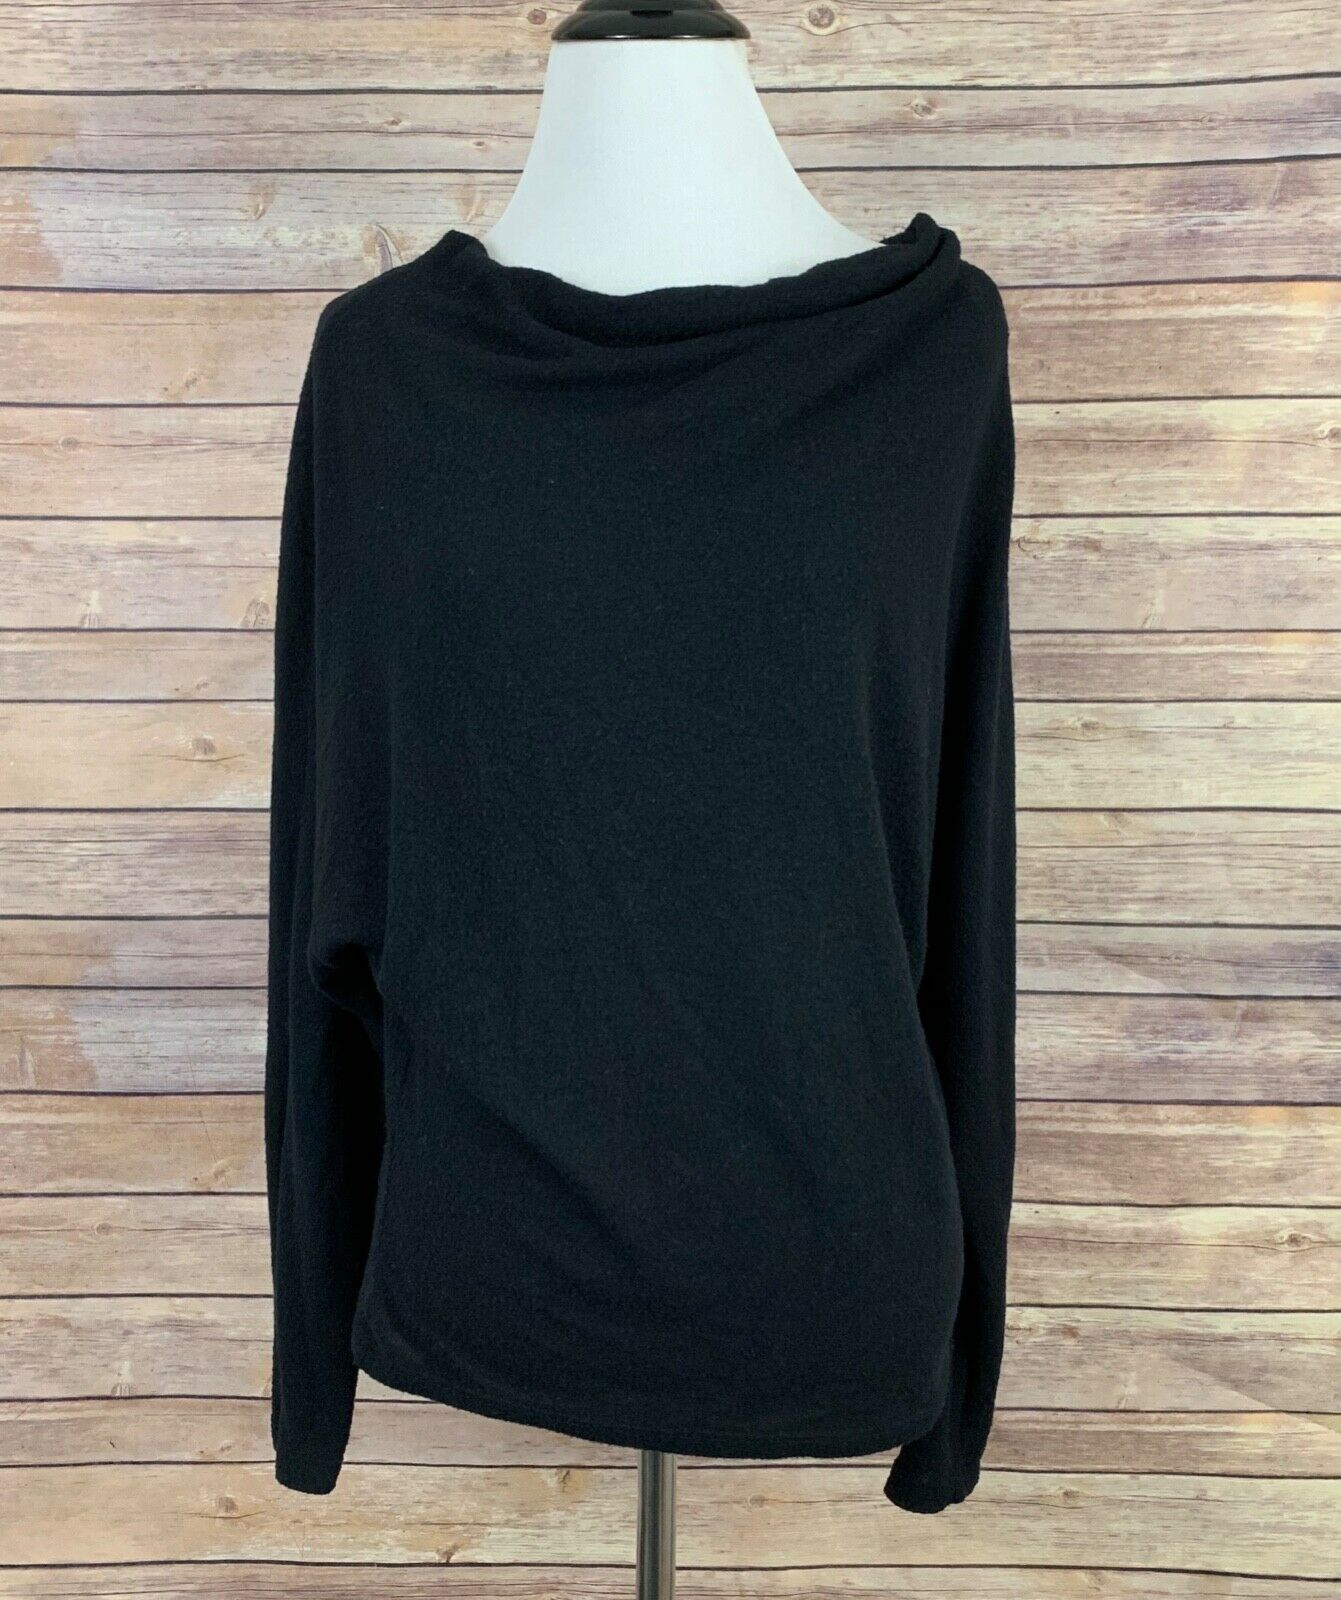 Sam & Lavi Dolman Sleeve Top (Size XS)